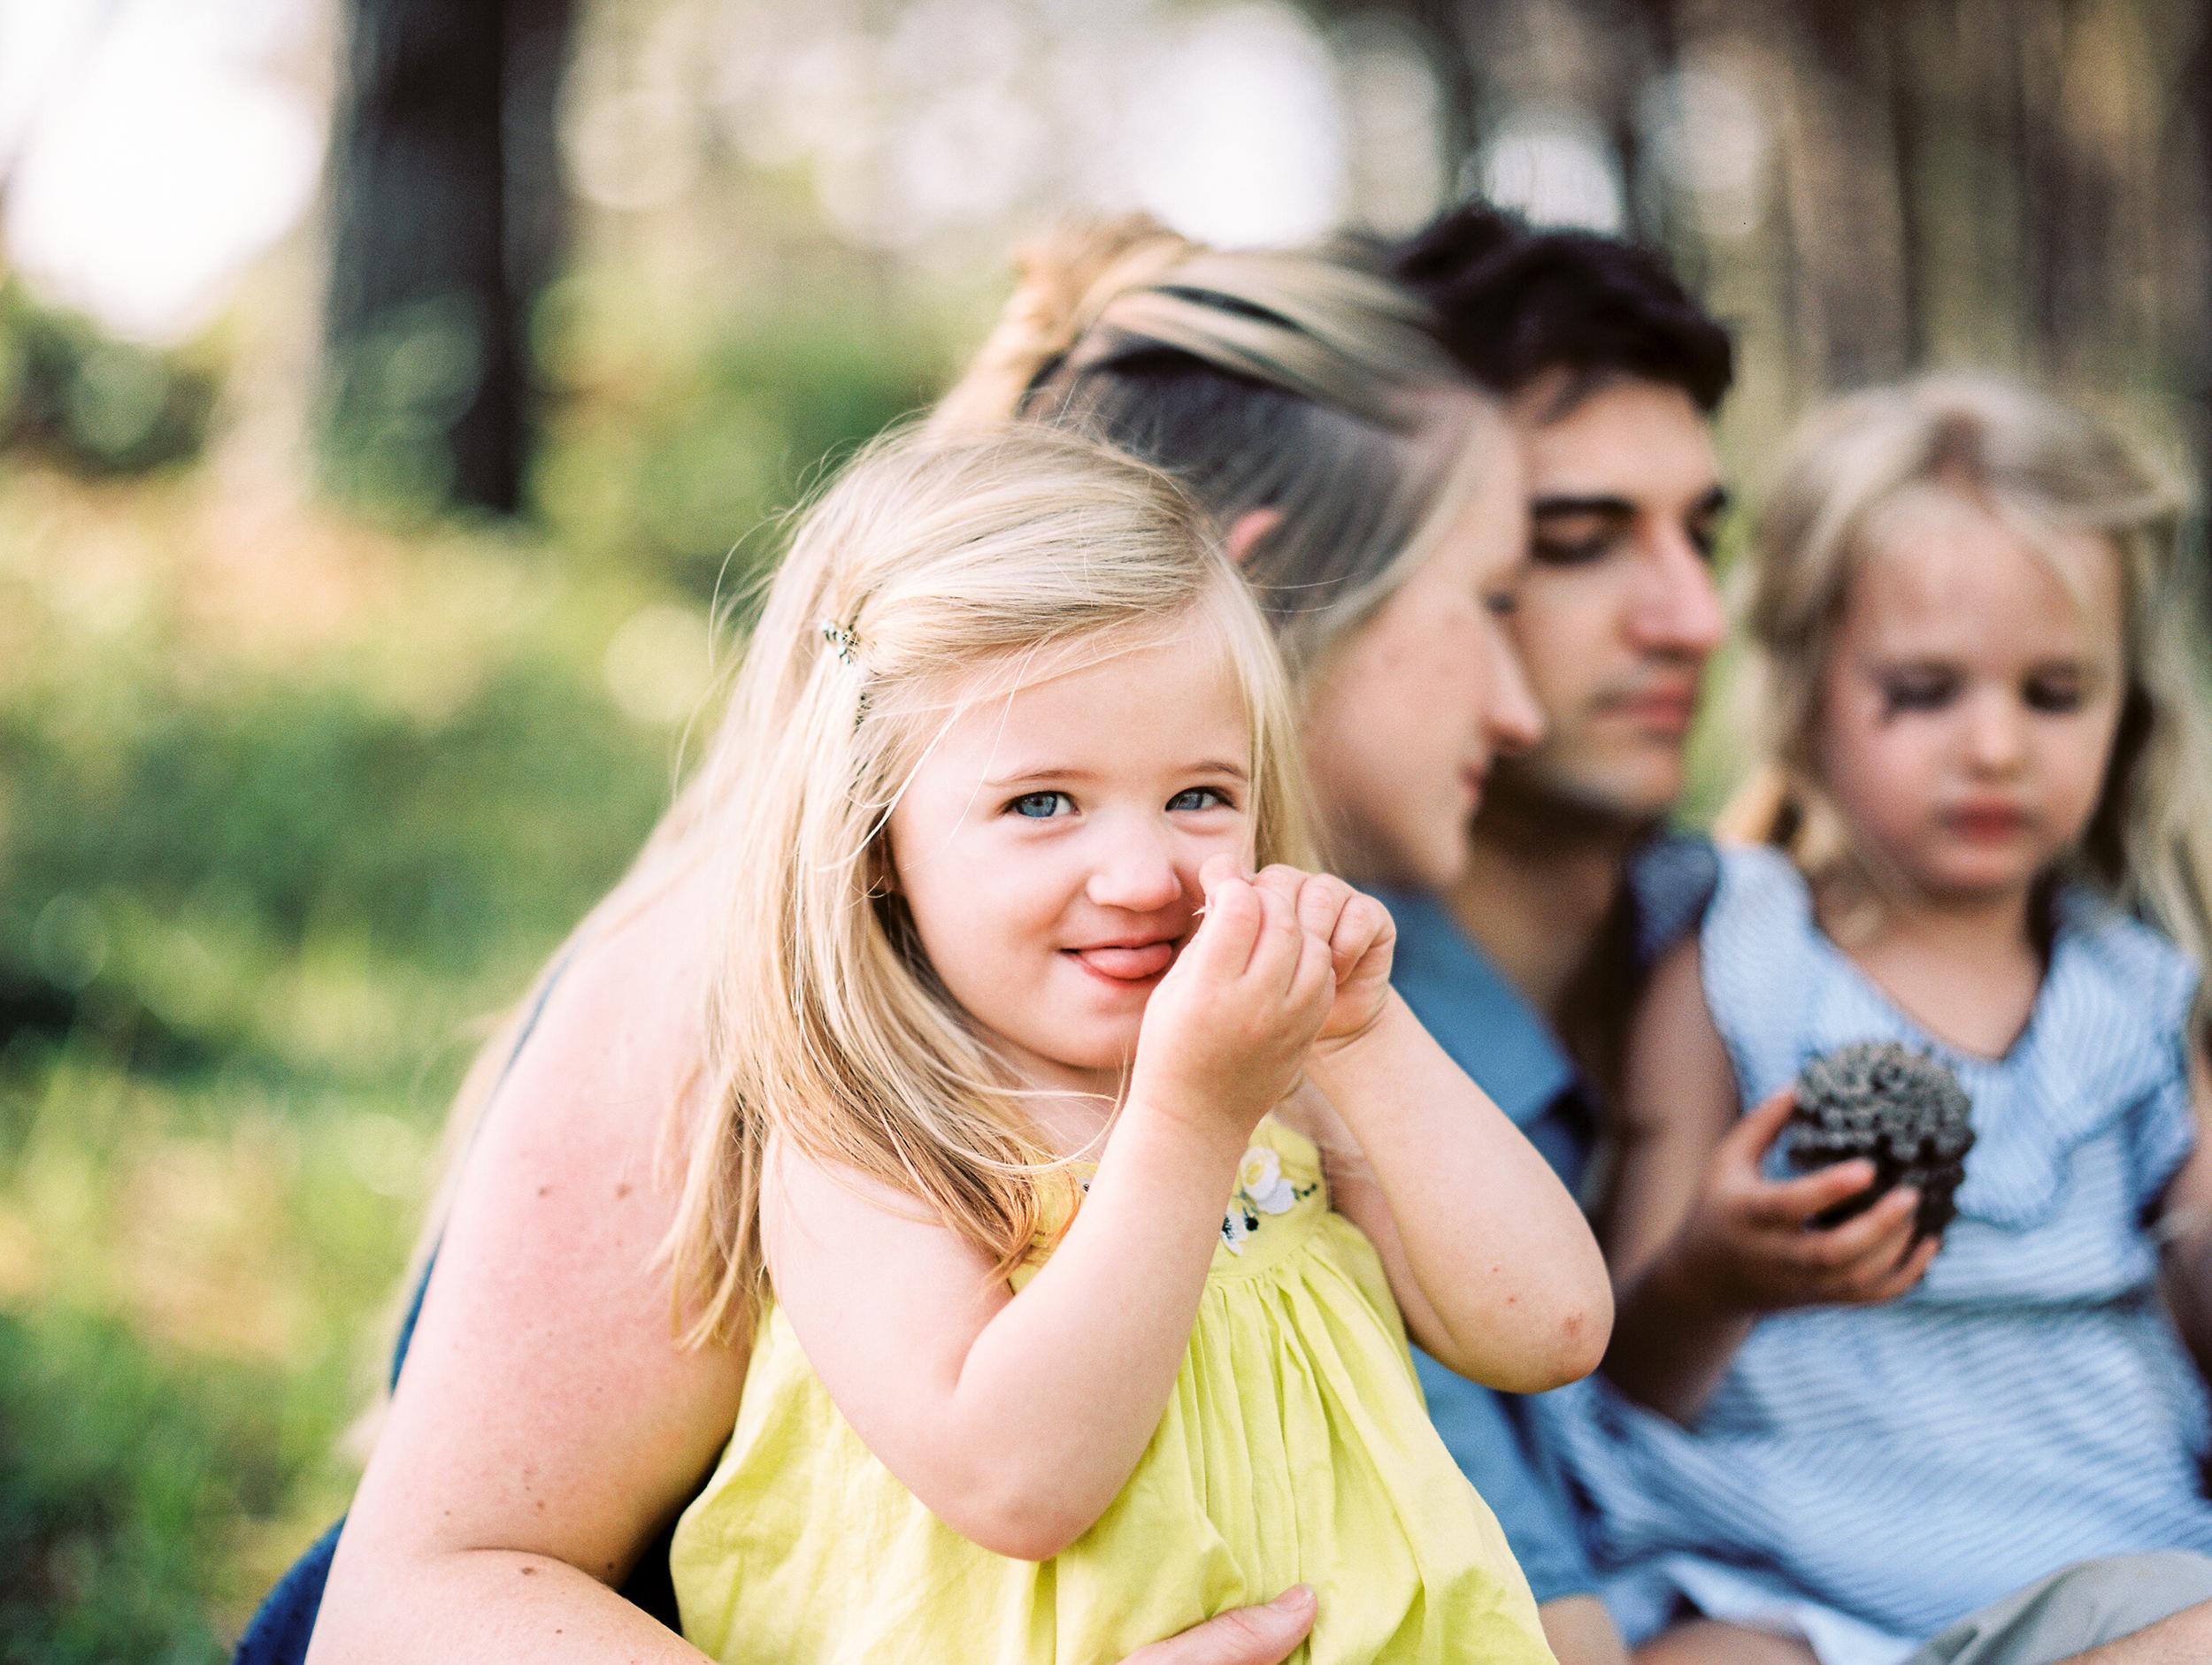 068-athens-georgia-children-and-family-film-photographer.jpg